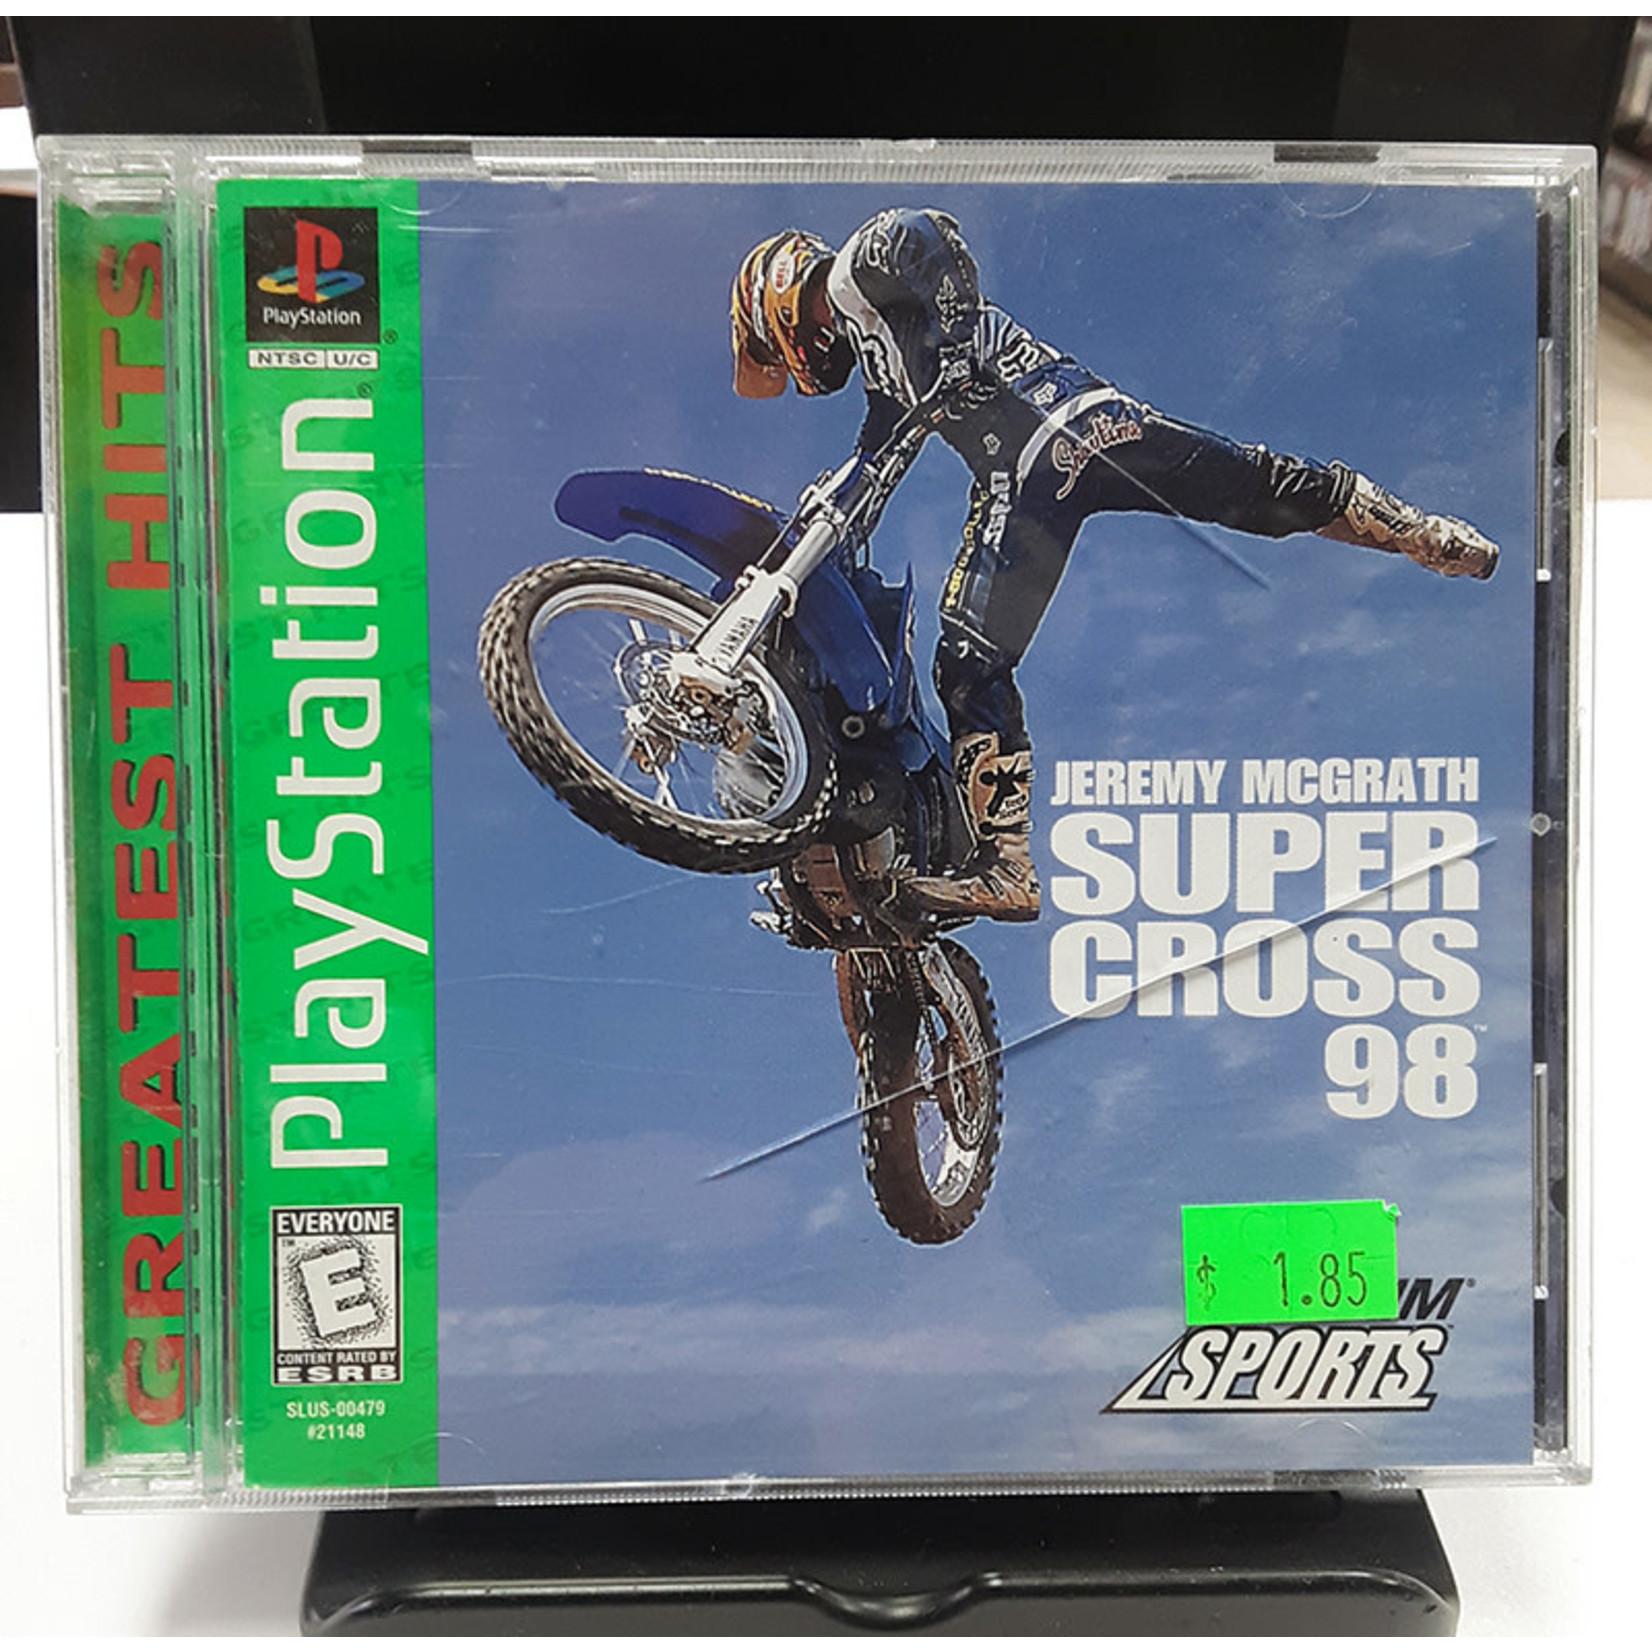 ps1u-Jeremy McGrath Supercross '98